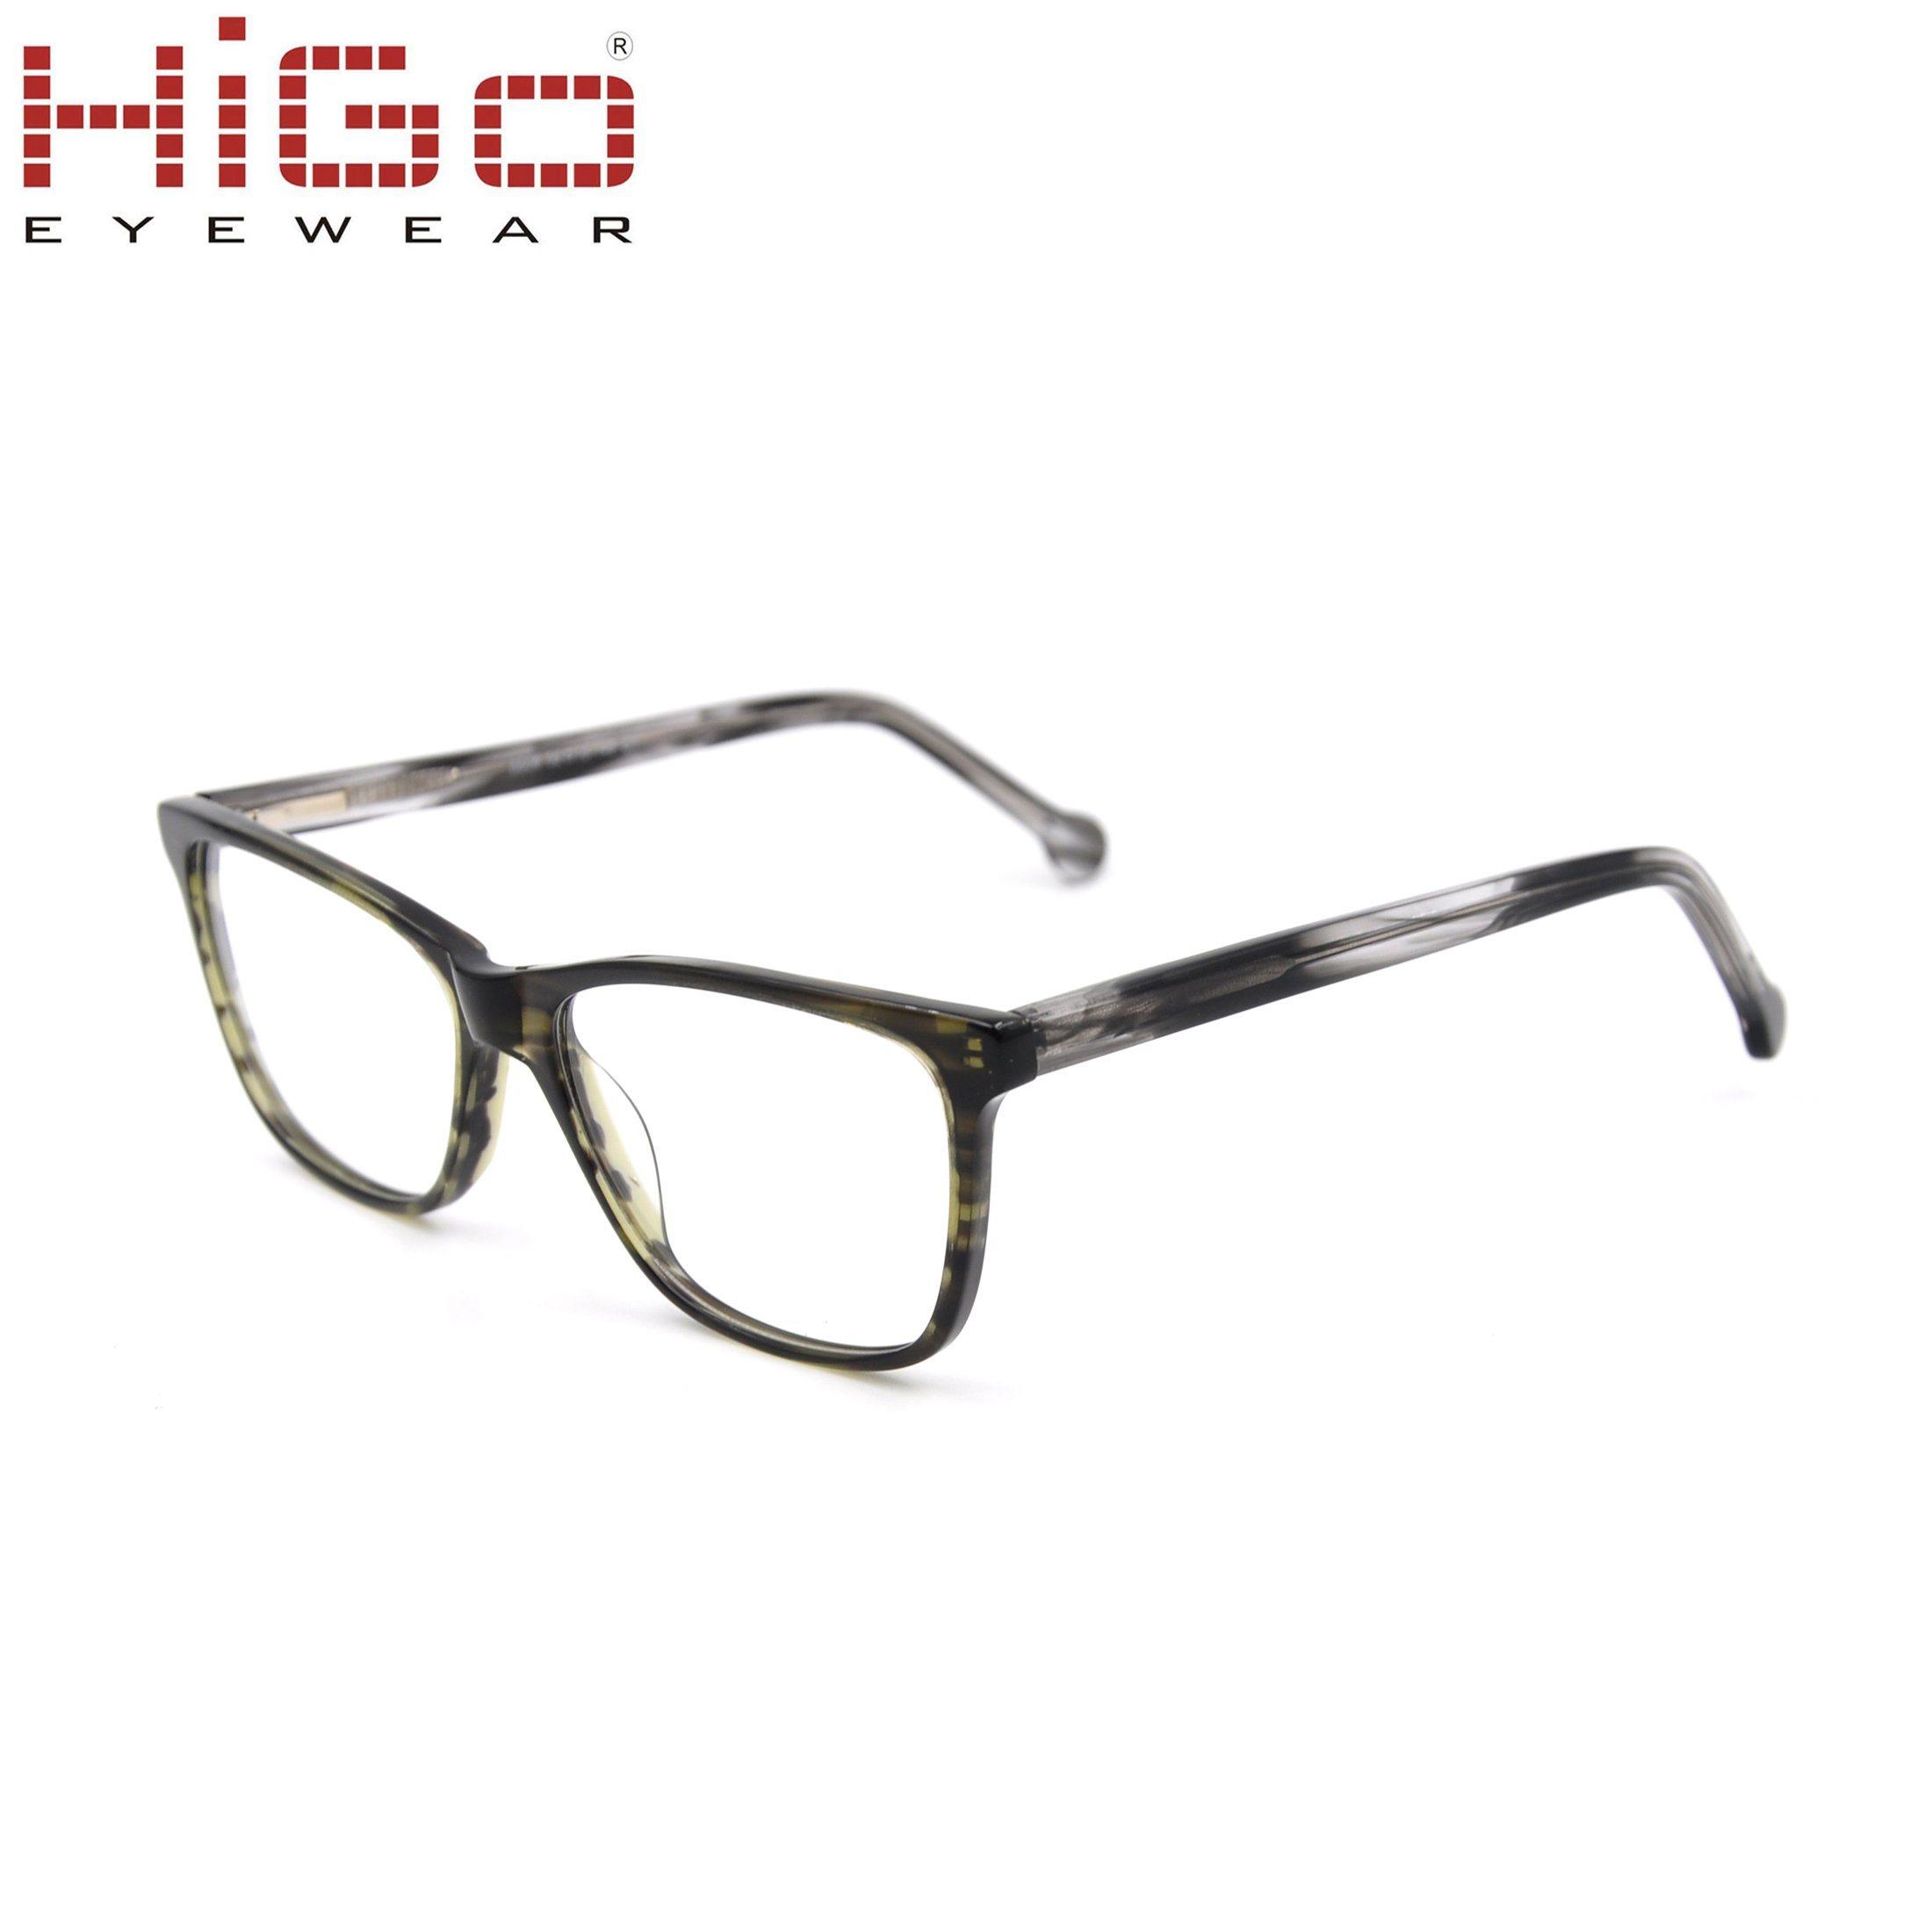 c91dd6292a7a China New Model Acetate Glasses Eyeglass Frame Eyewear Frame Photos ...